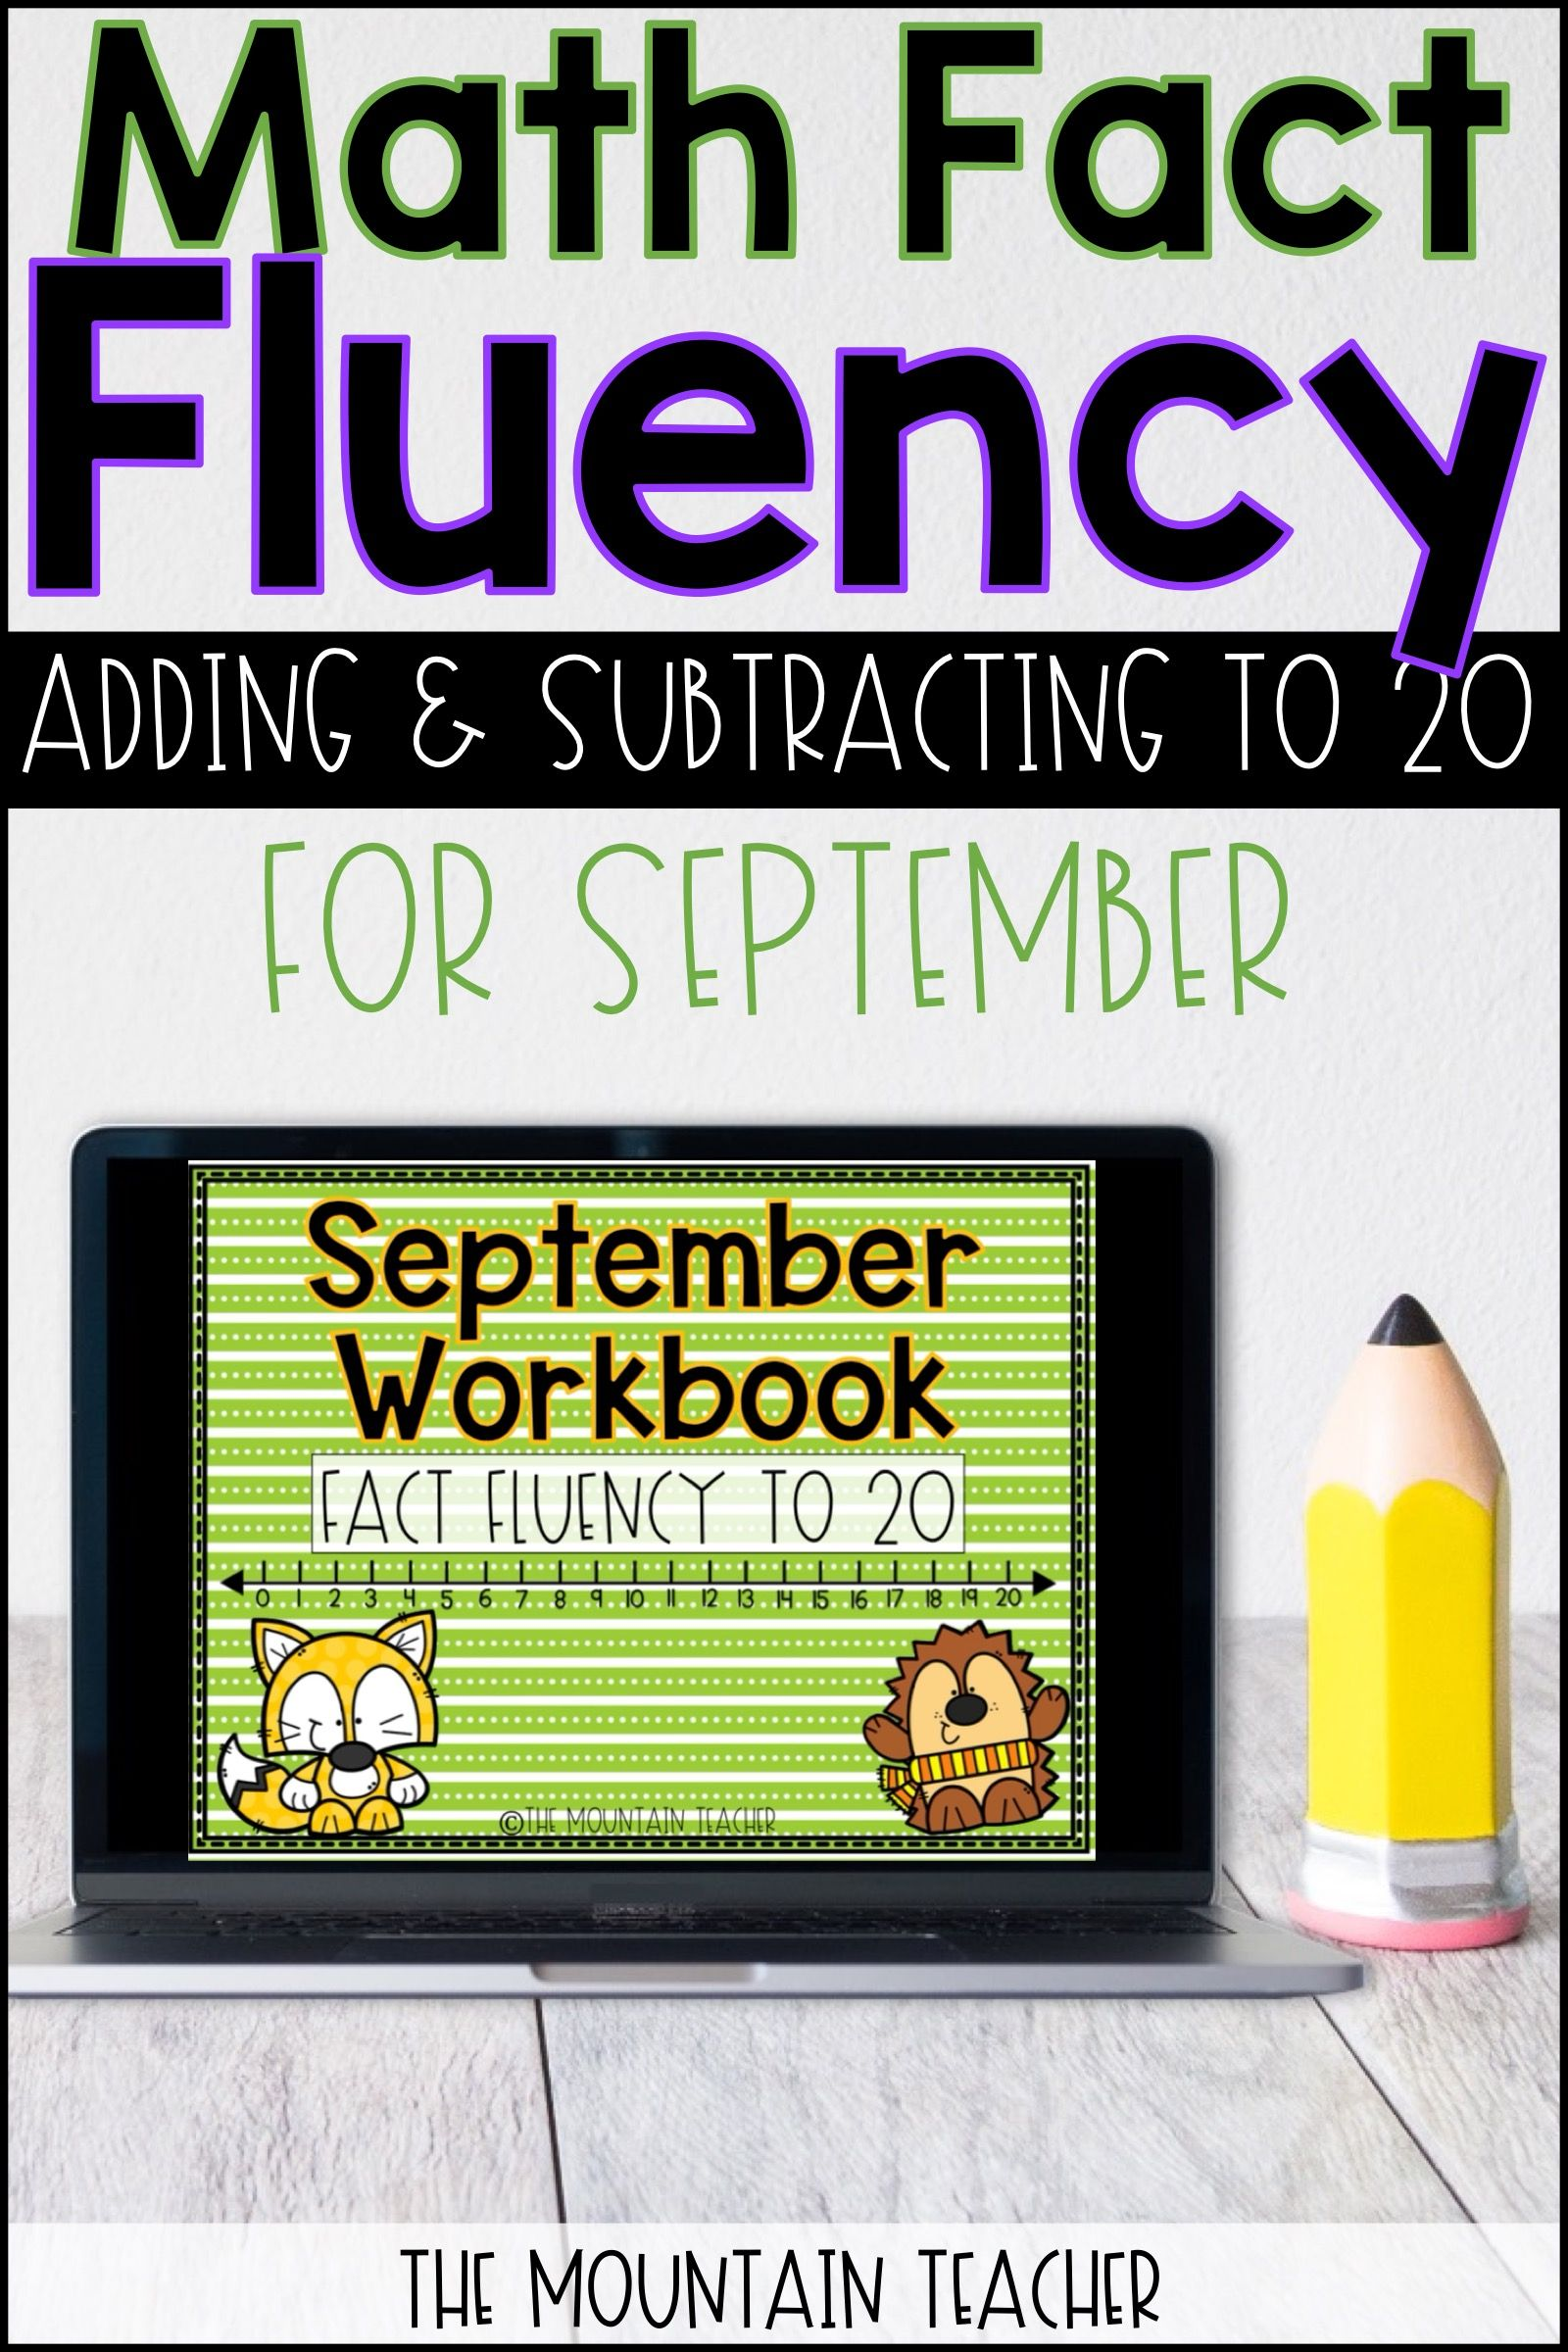 No Prep September Fact Fluency To 20 Math Worksheets Printable And Google Slides Math Facts Math Fact Fluency Fact Fluency